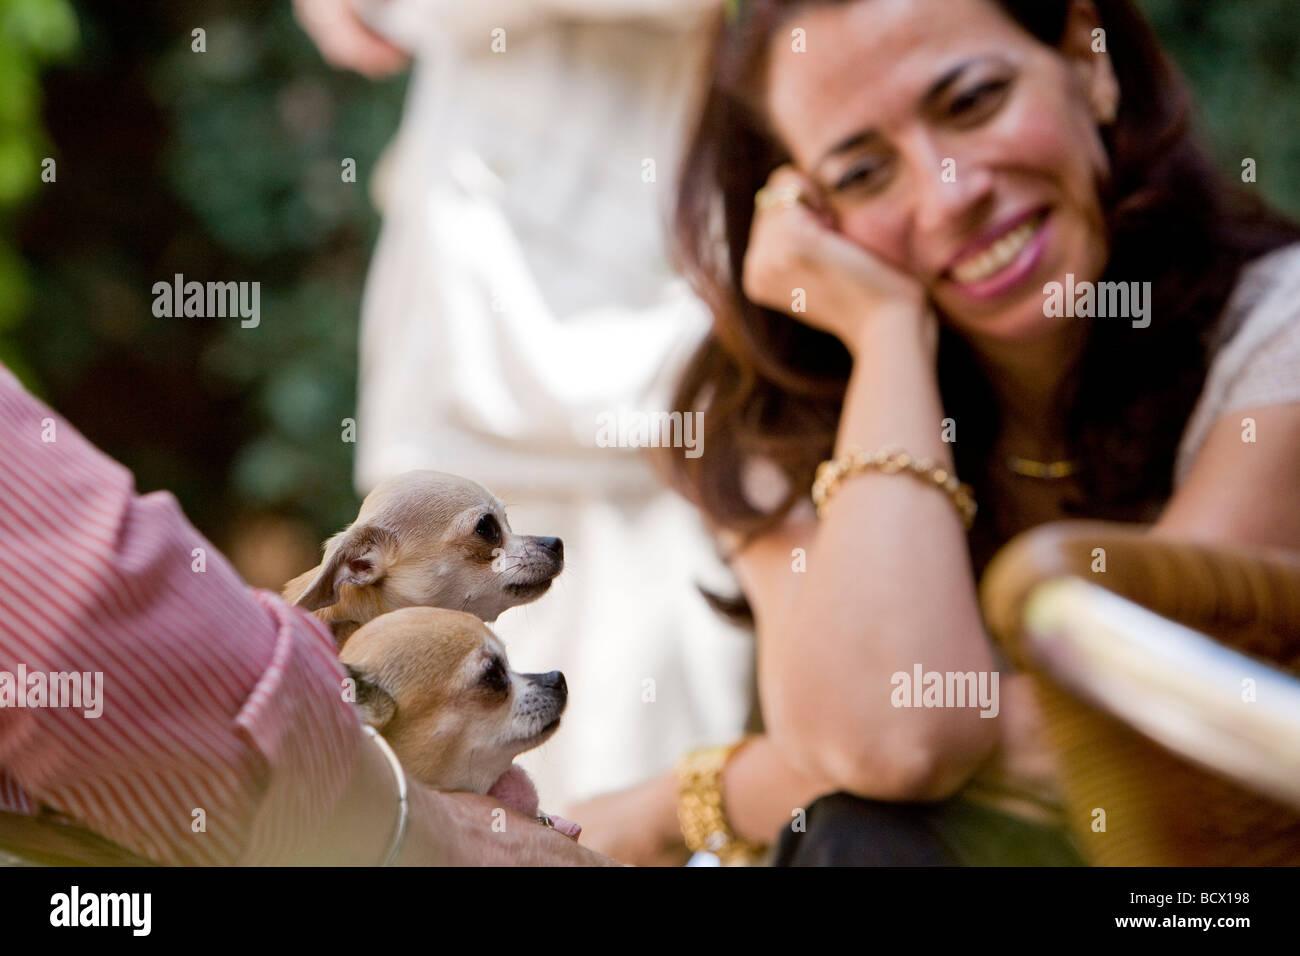 Chihuahua love - Stock Image